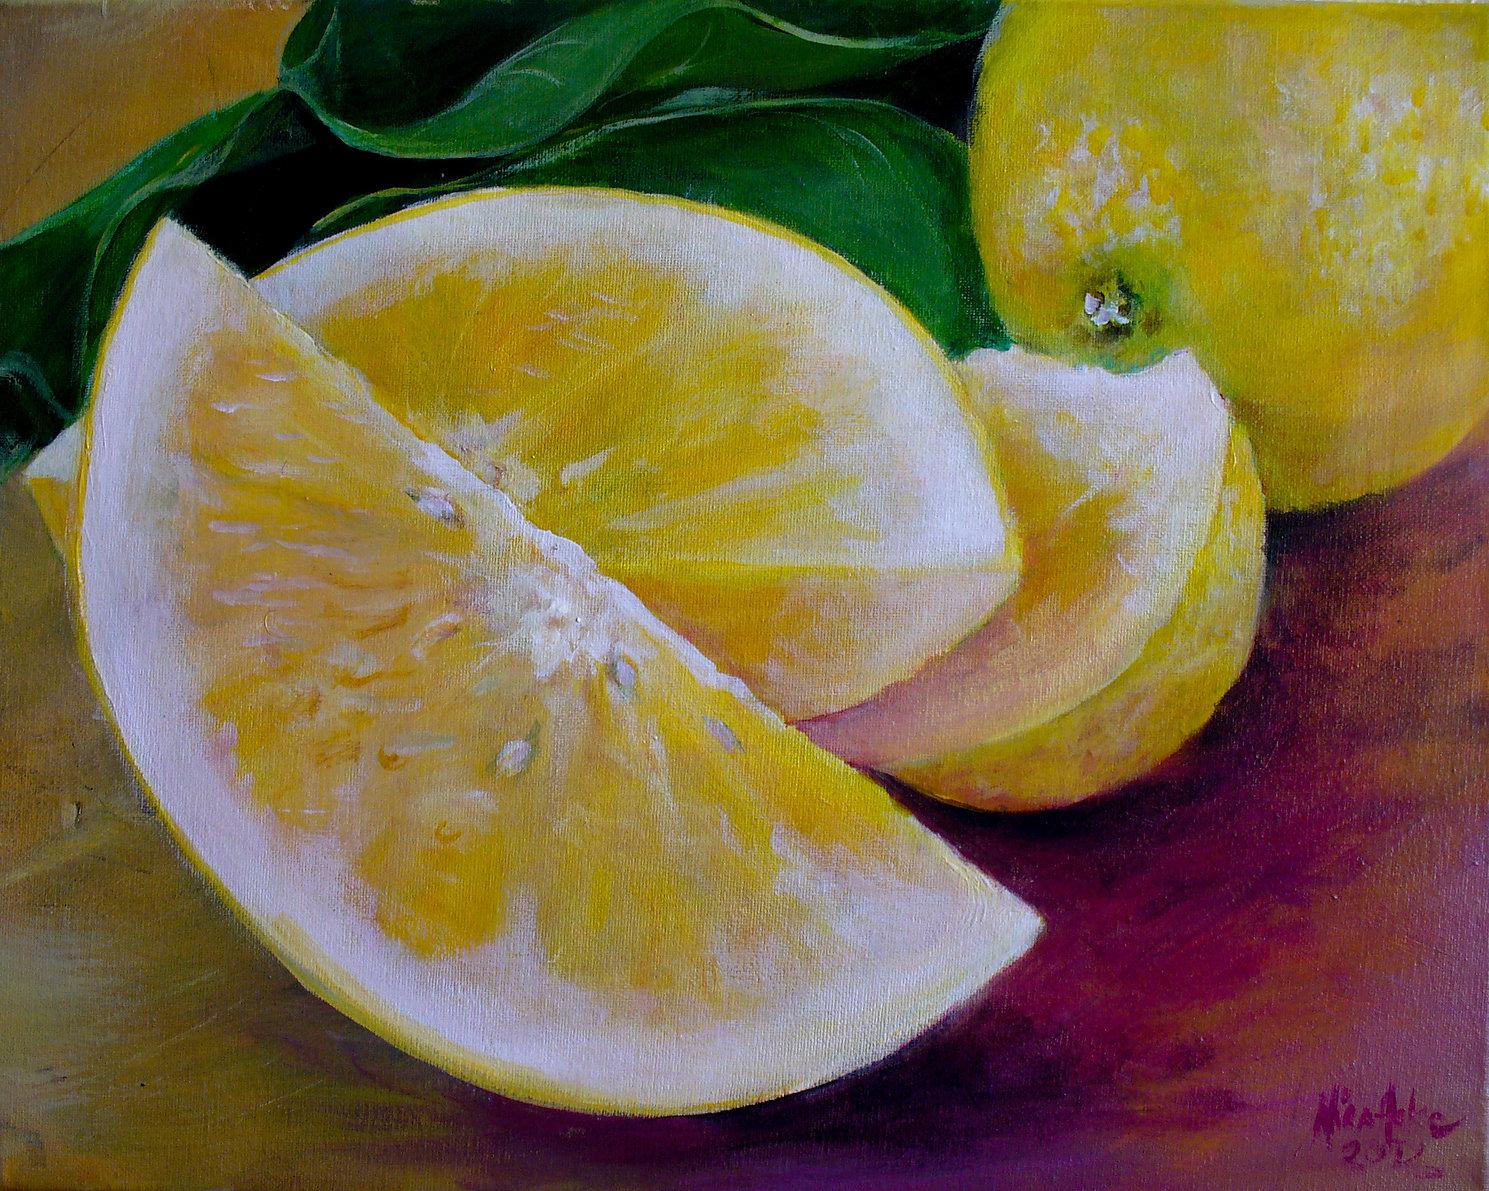 lemons 4_edited.jpg Lemons and Basil  Acrylic Paintings   Mira Hoke  Black Diamond, WA